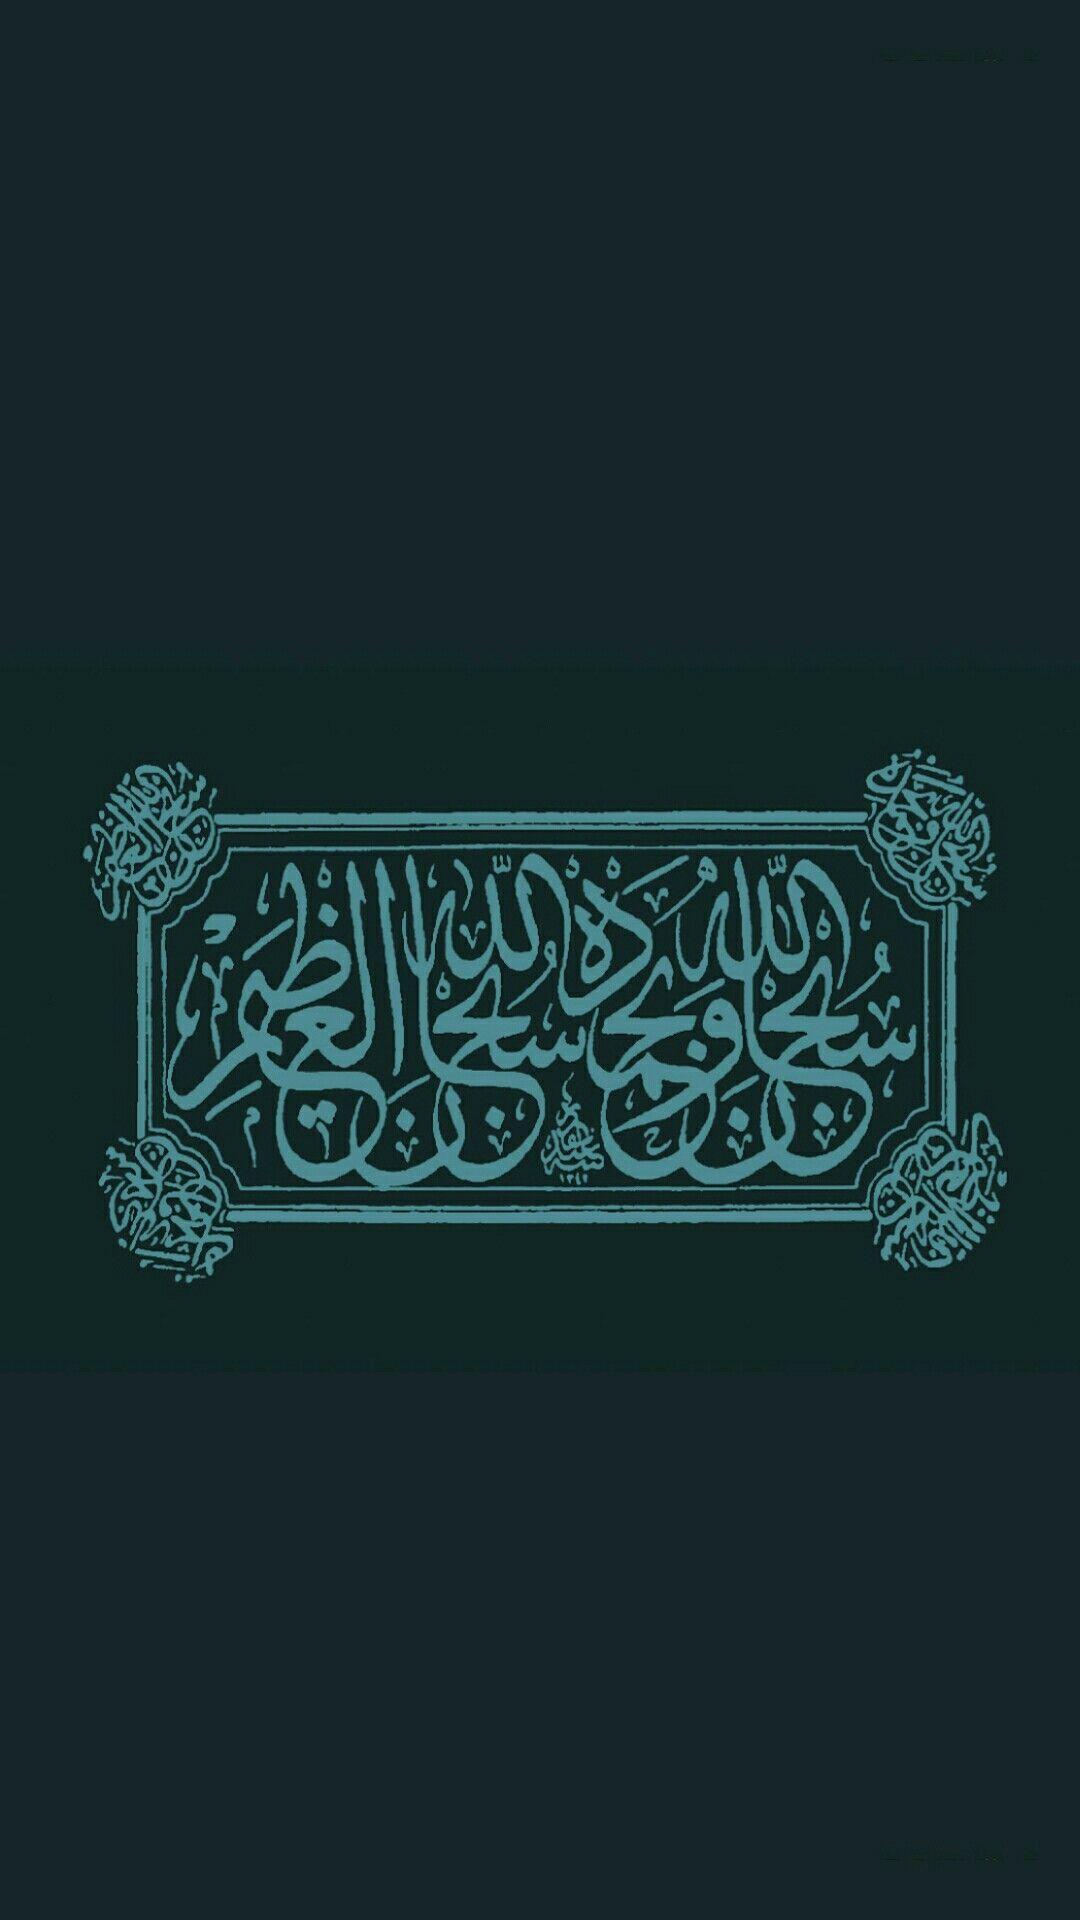 Pin By Ghayur On Allah Swt Background Design Islamic Wallpaper Wallpaper